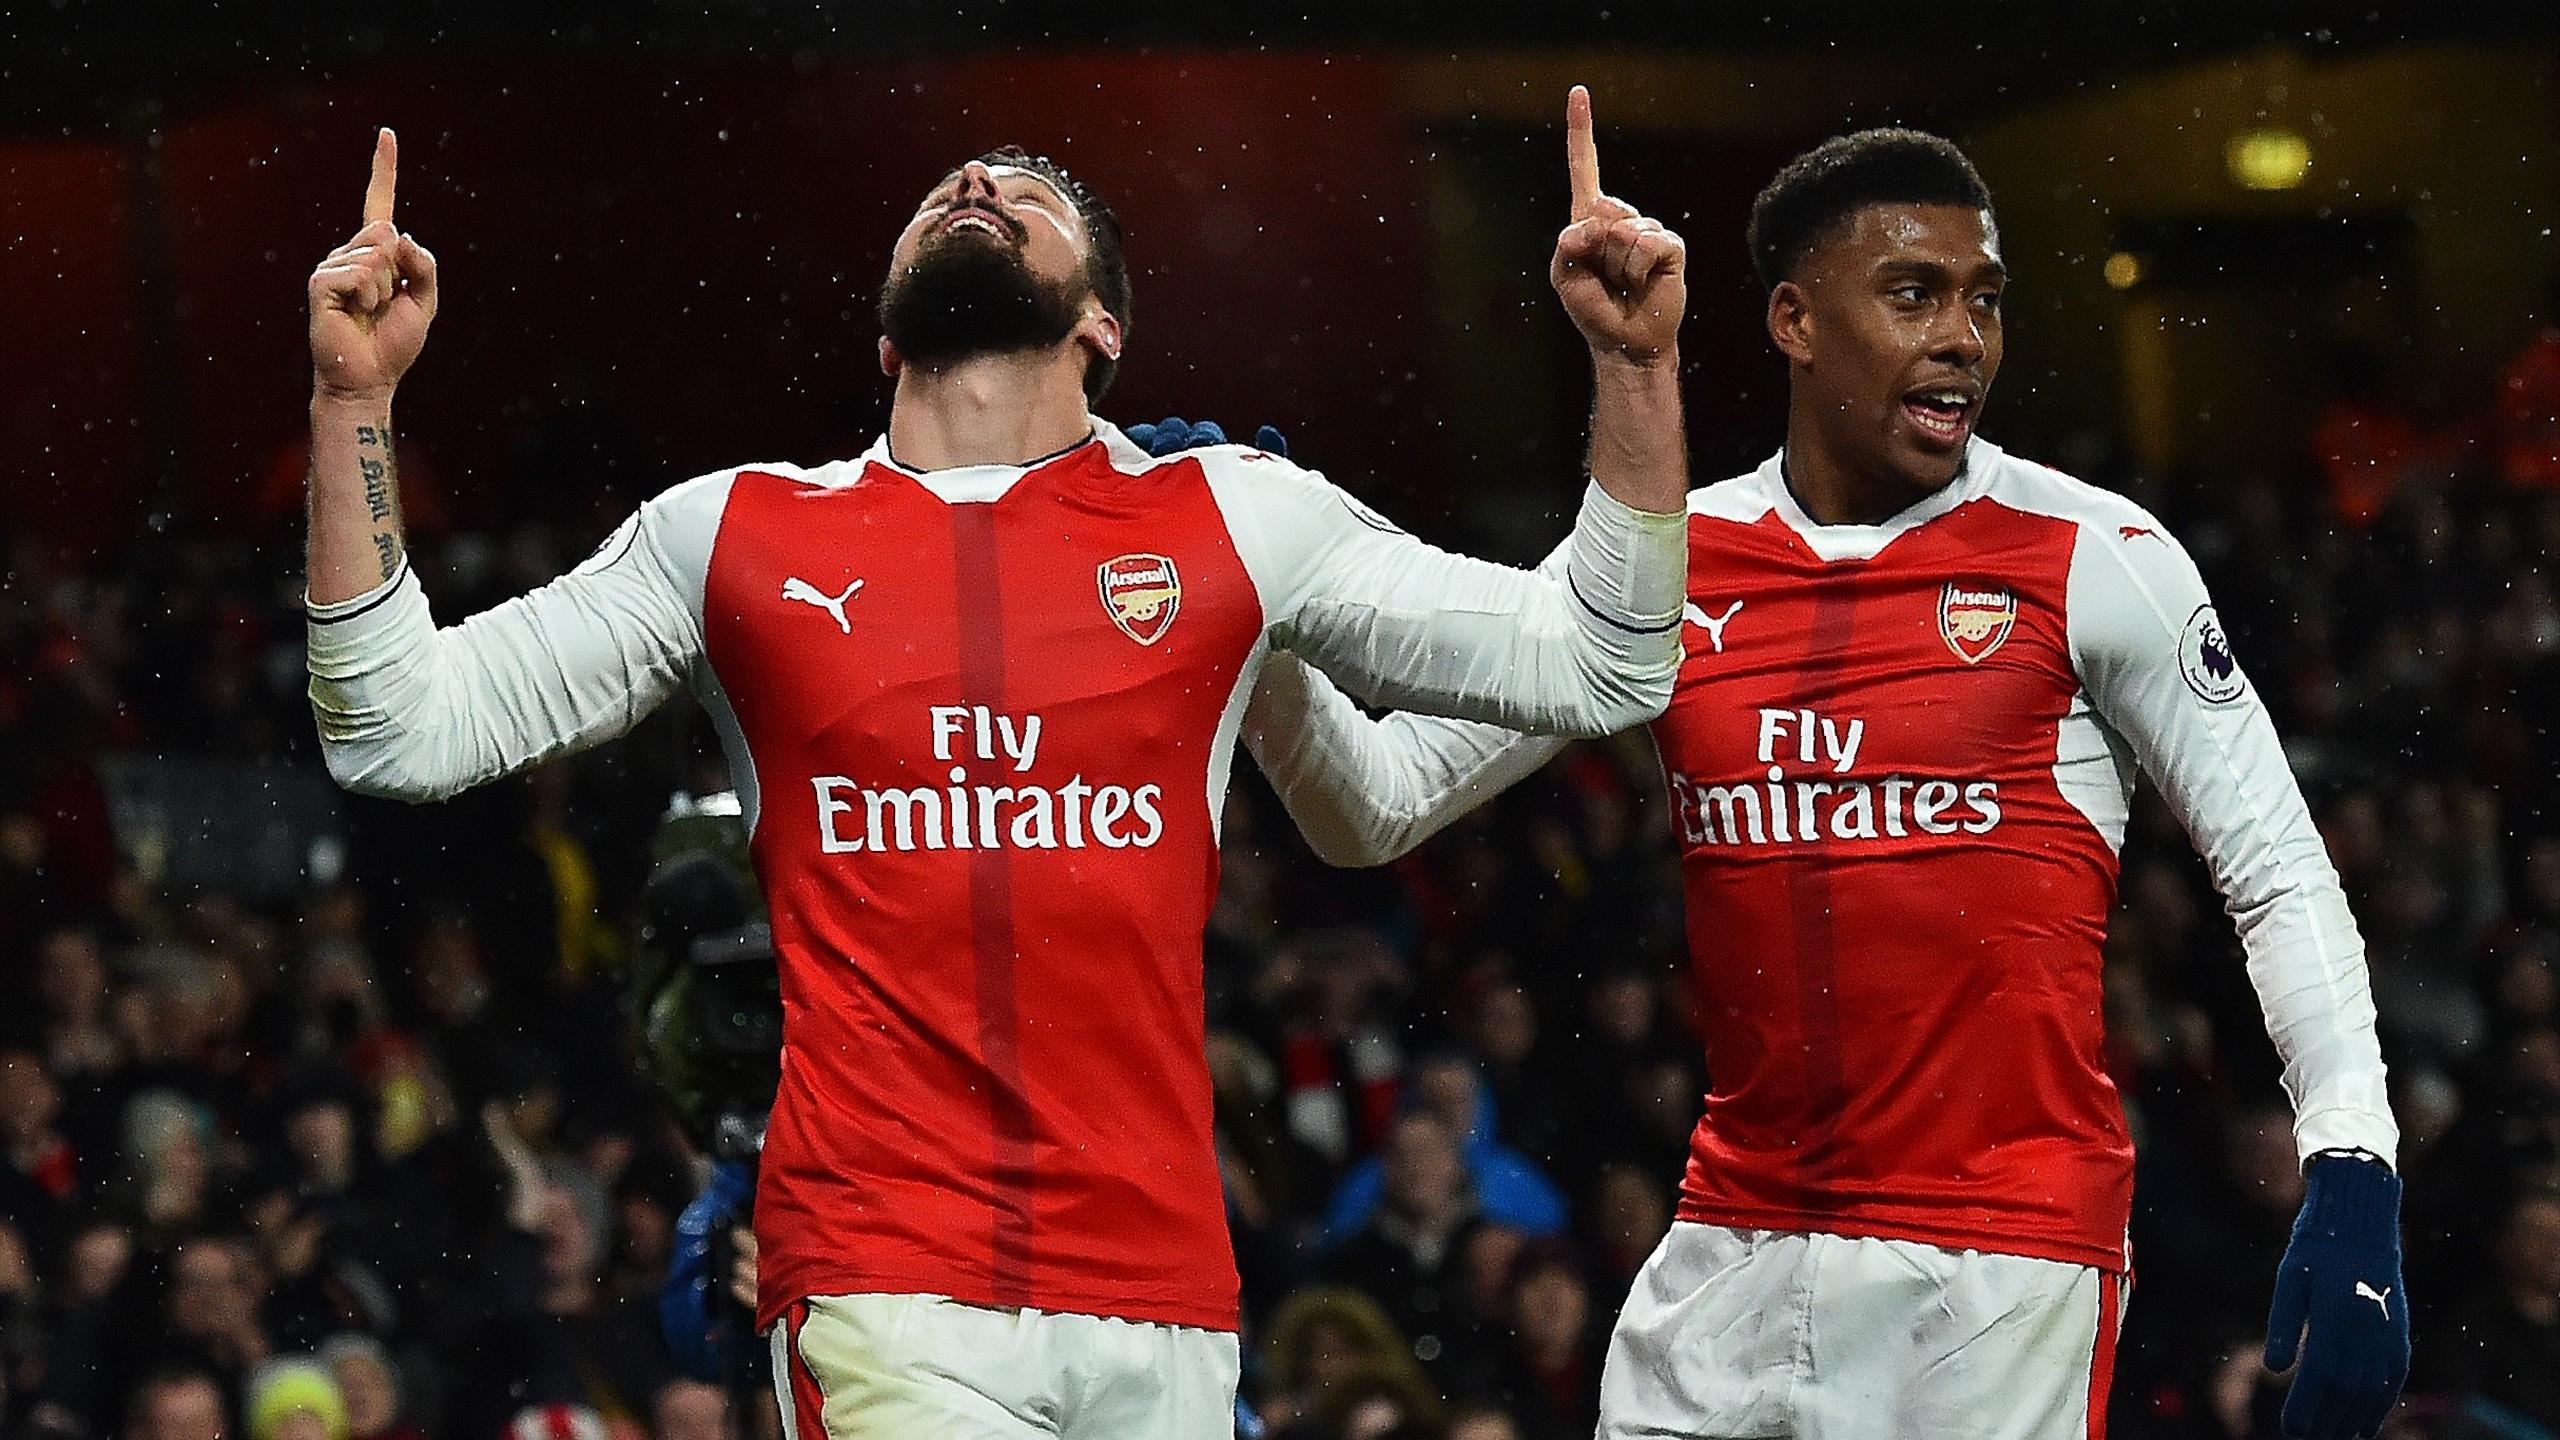 Arsenal's French striker Olivier Giroud (L) celebrates scoring his team's first goal